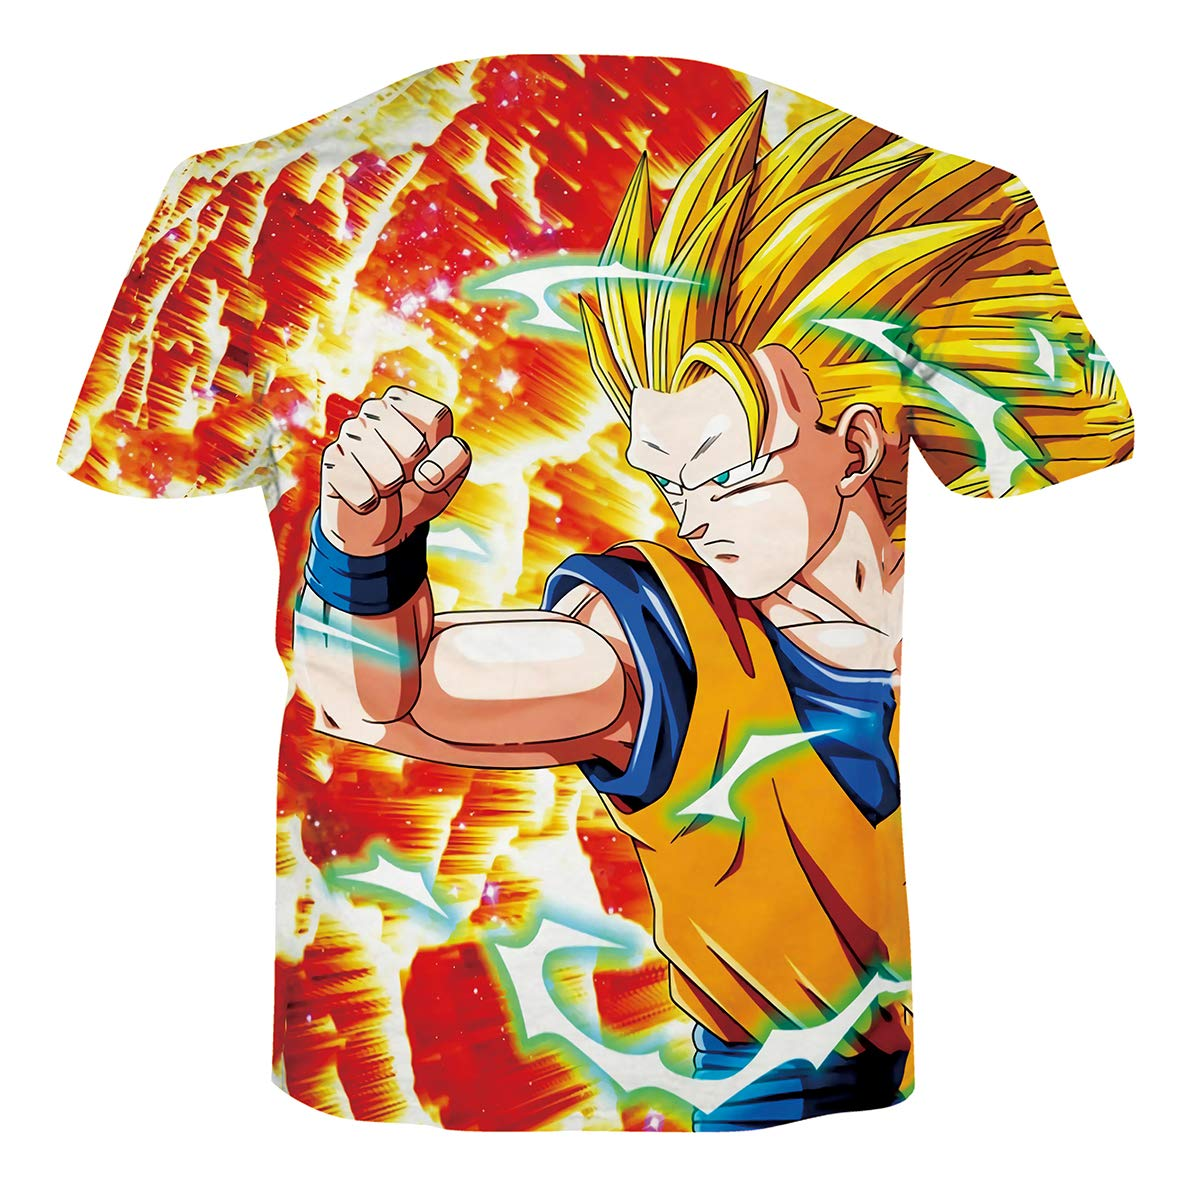 Ocsoc Women Men Dragon Ball Z Vegeta Goku Super Saiyan Print Casual 3D T-Shirt Tee